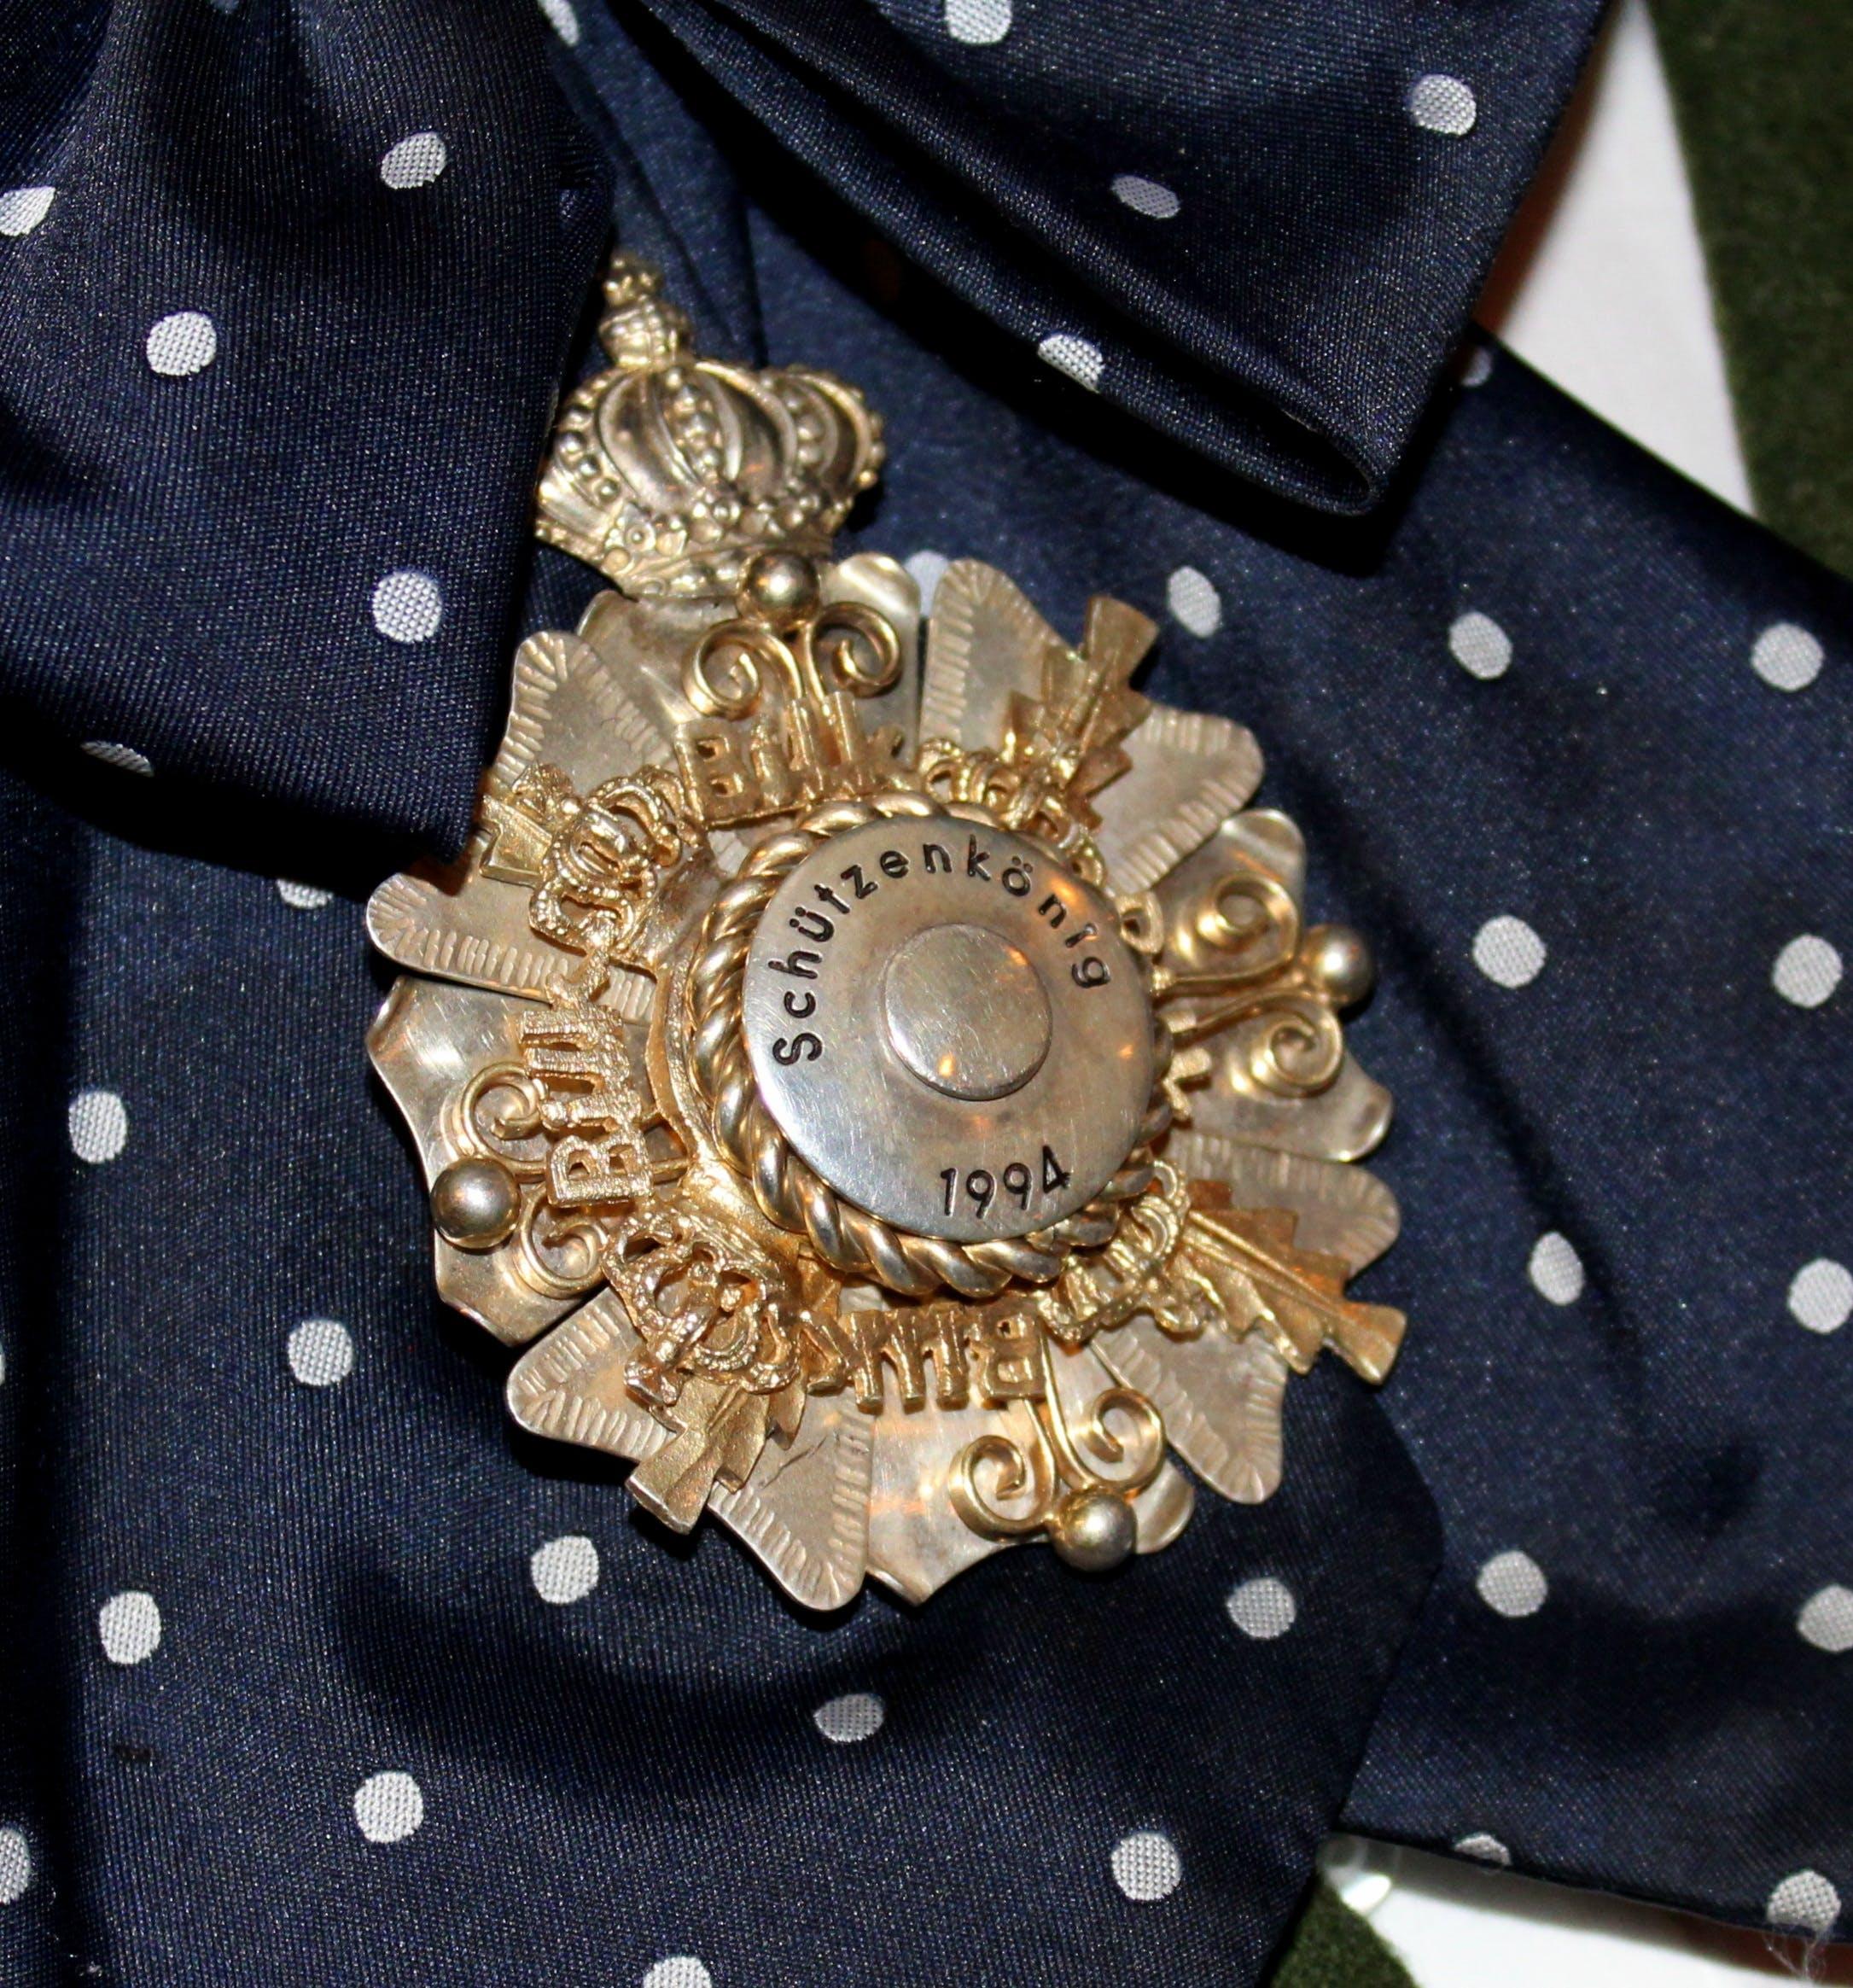 Free stock photo of düsseldorf, king order, royal silver, shooting club